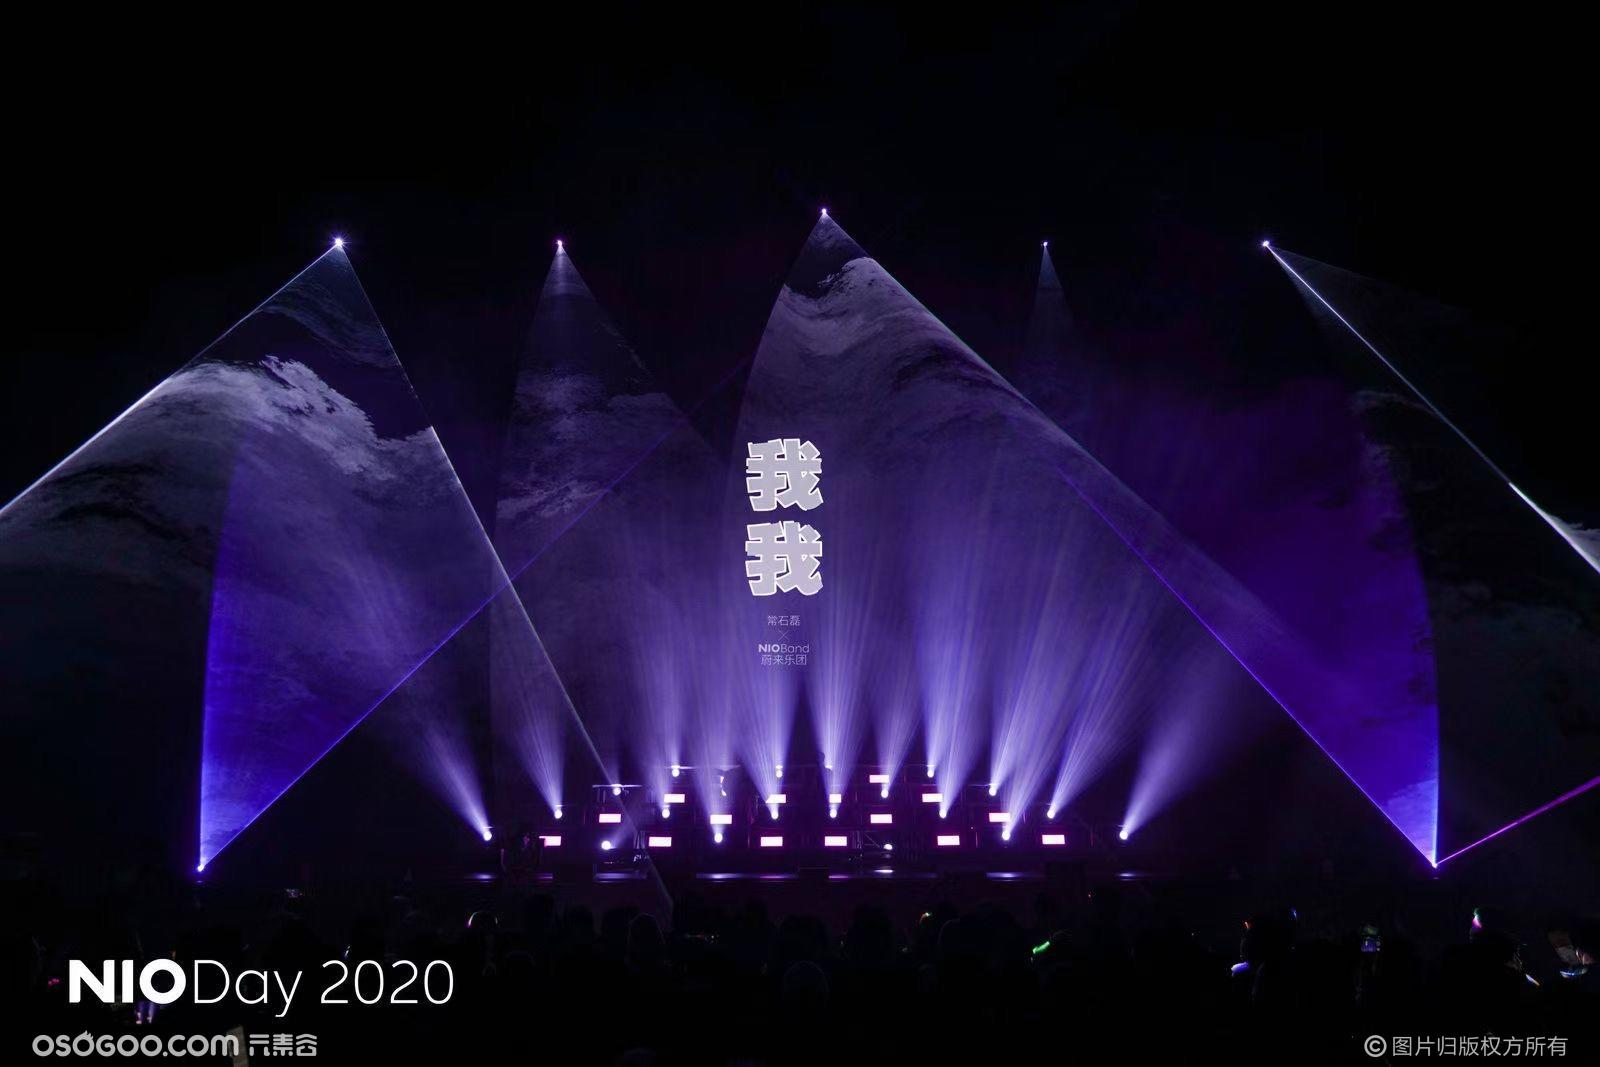 蔚来2020 NIO Day发布会